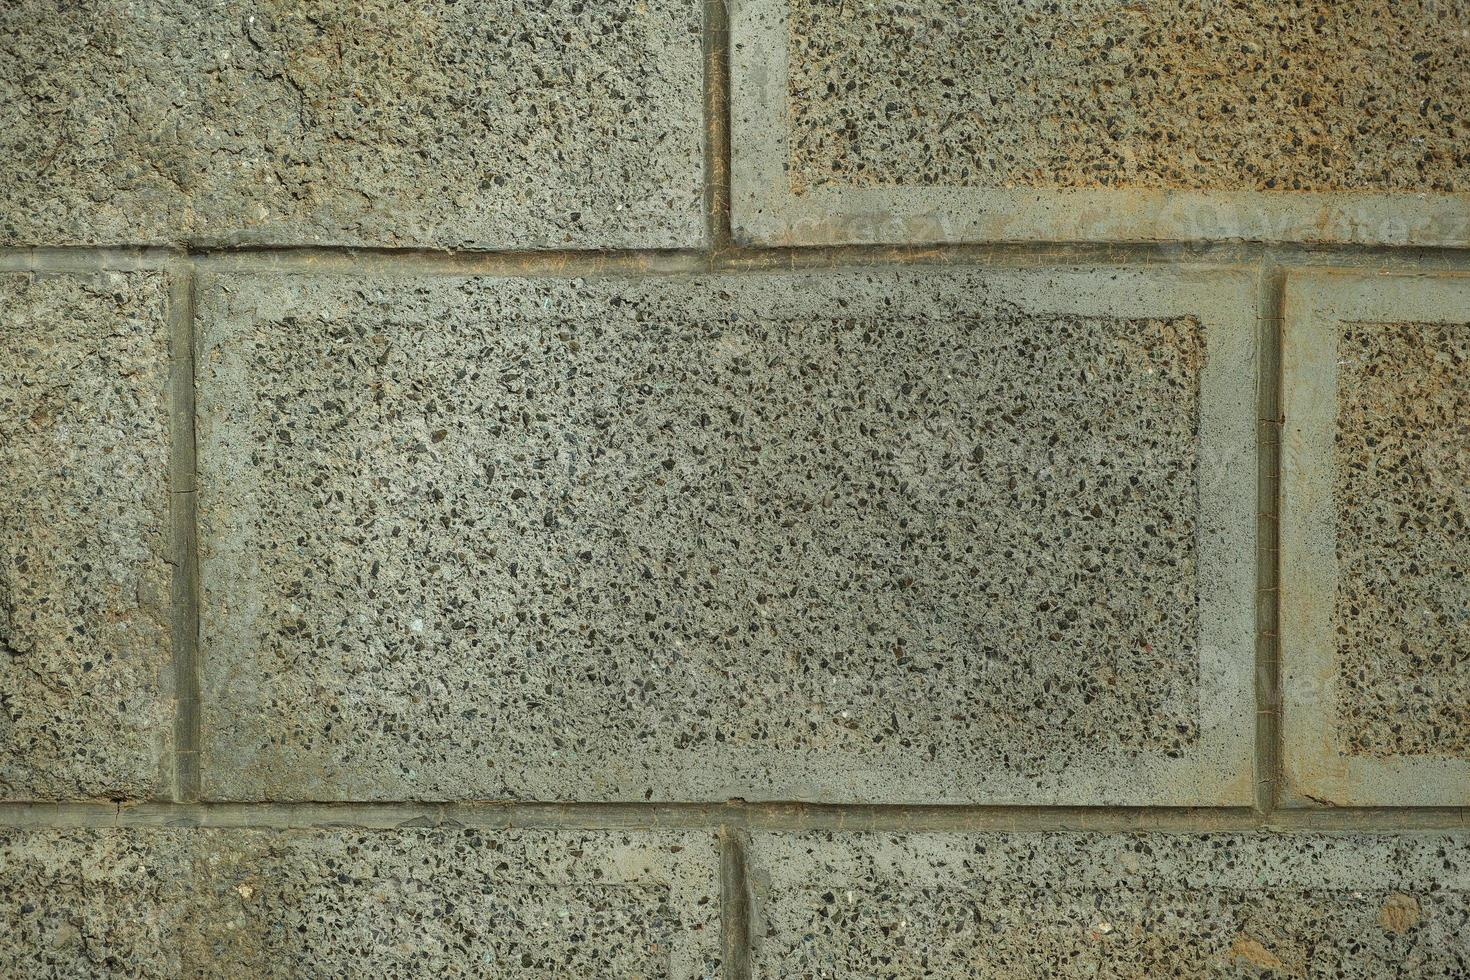 stone wall close-up photo